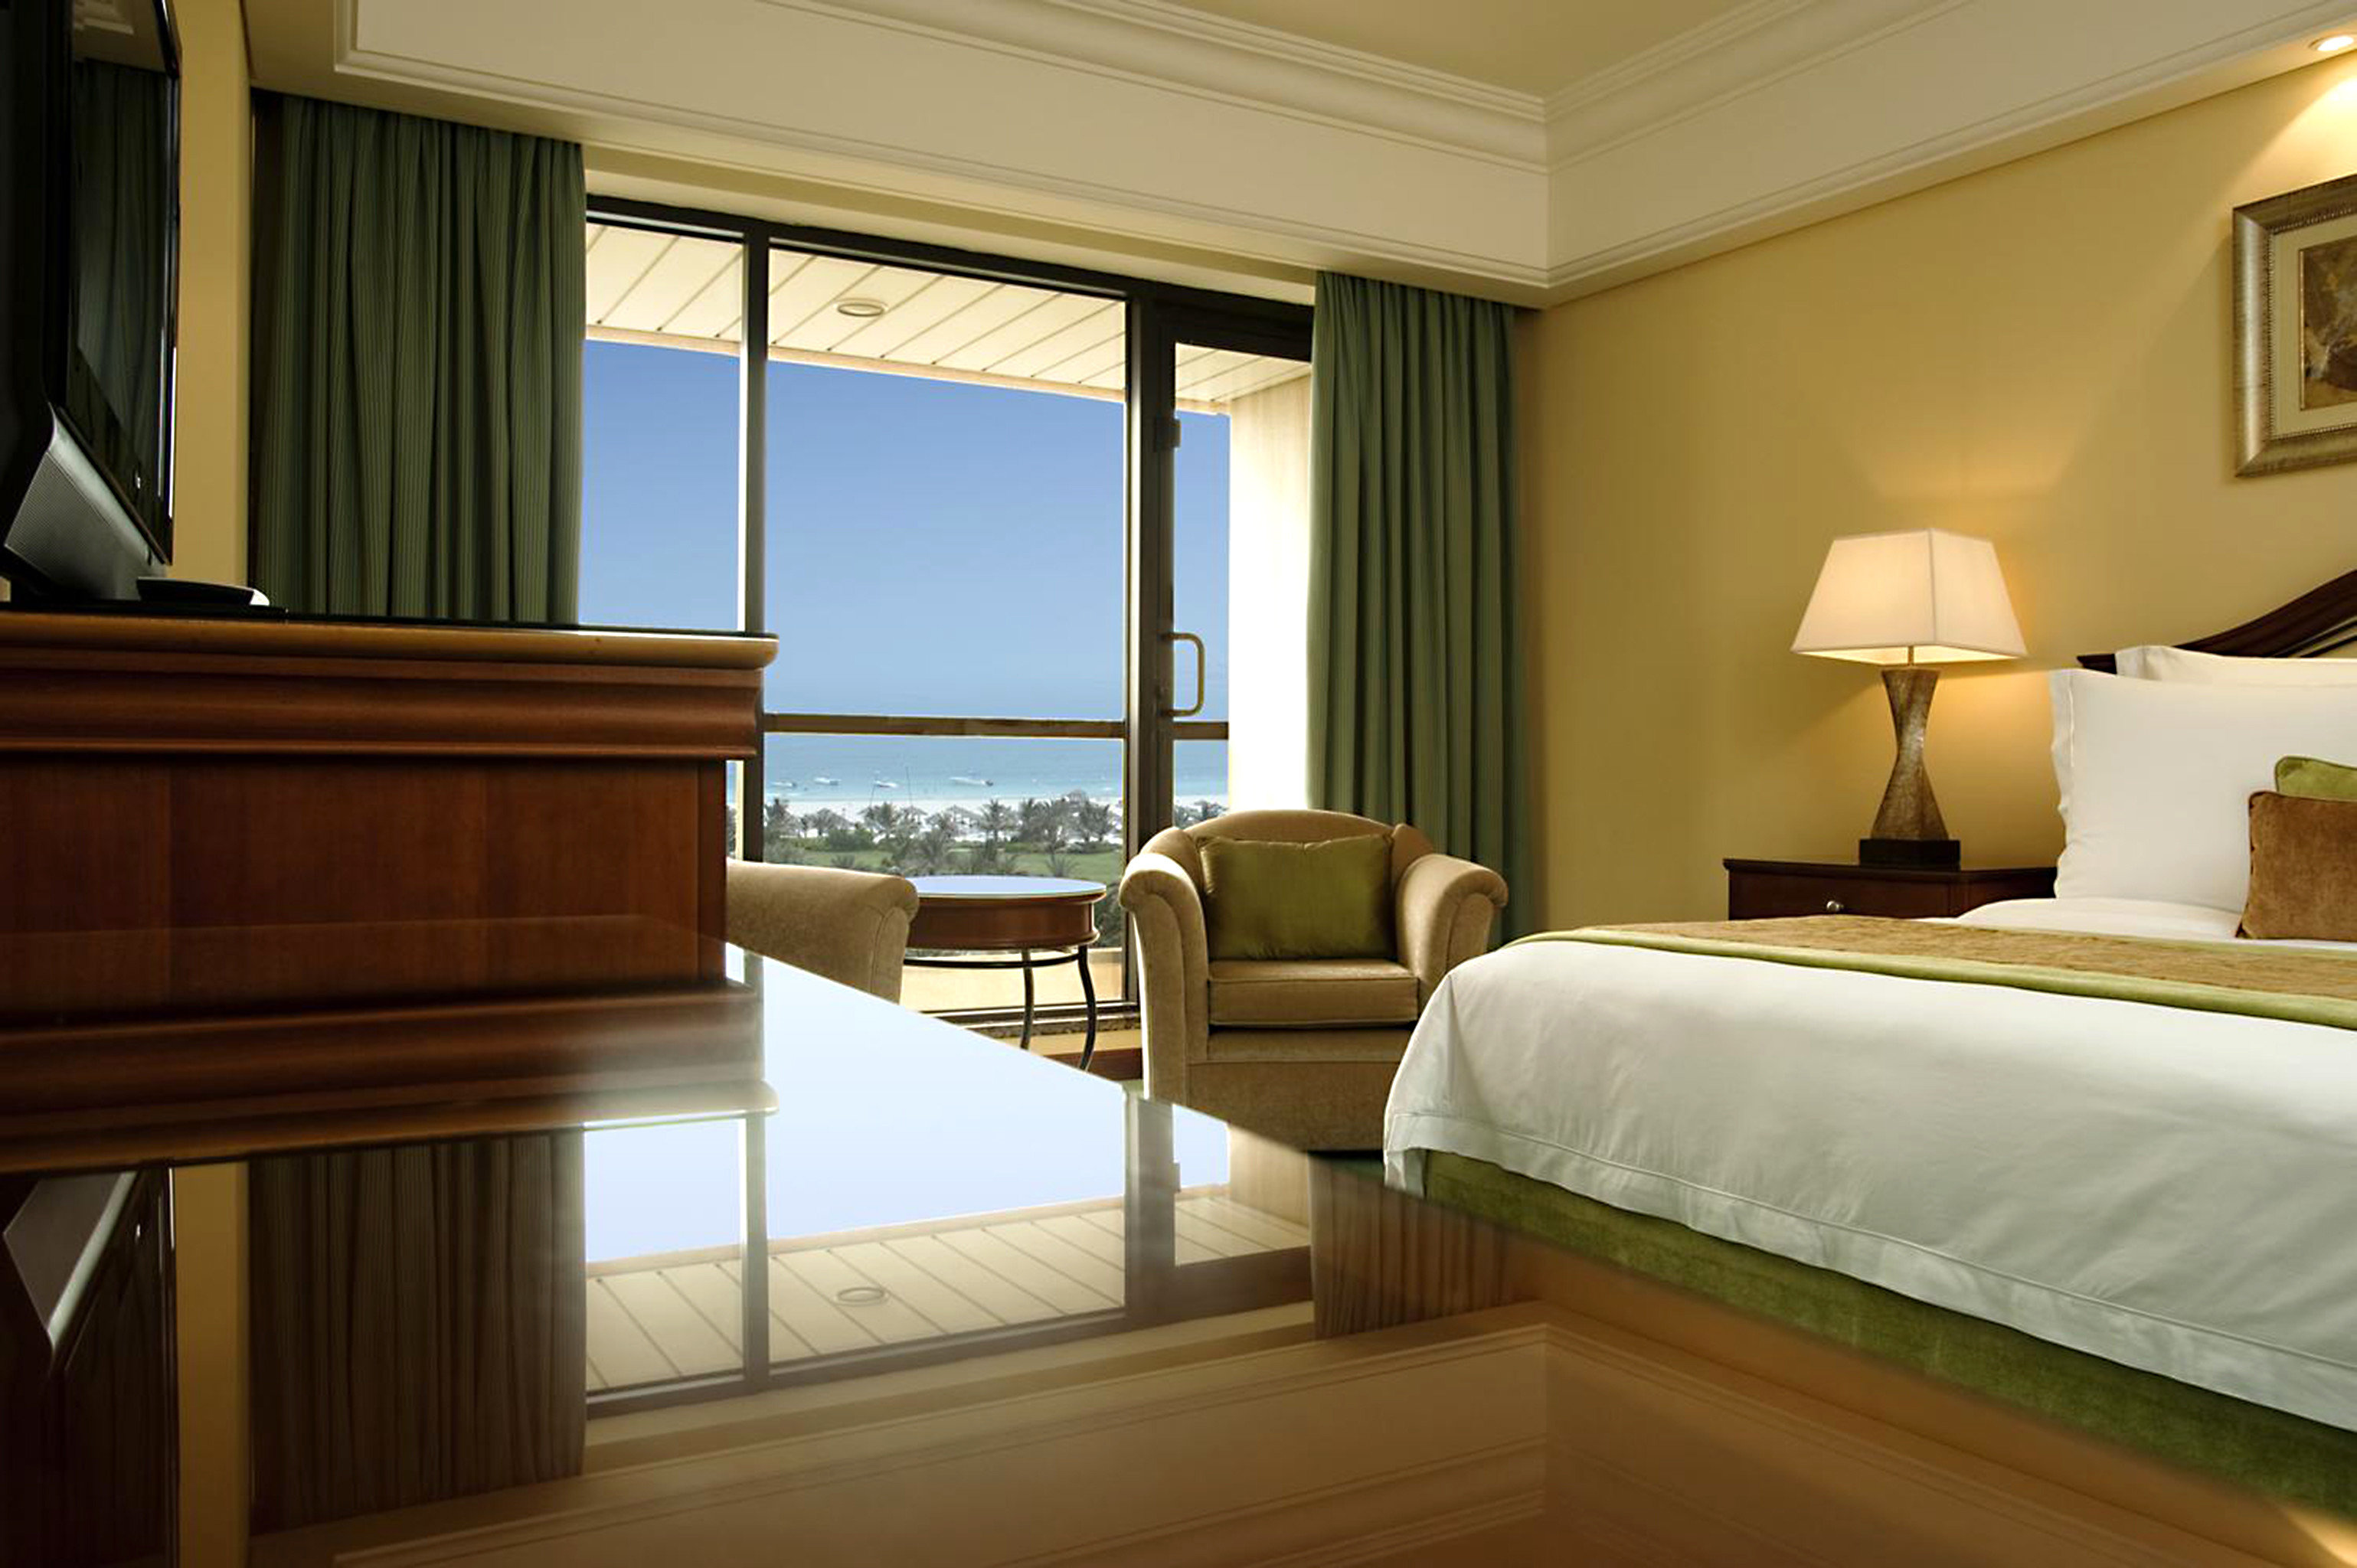 Balcony Bedroom Lounge Scenic views Suite sofa property home condominium pillow living room lamp night